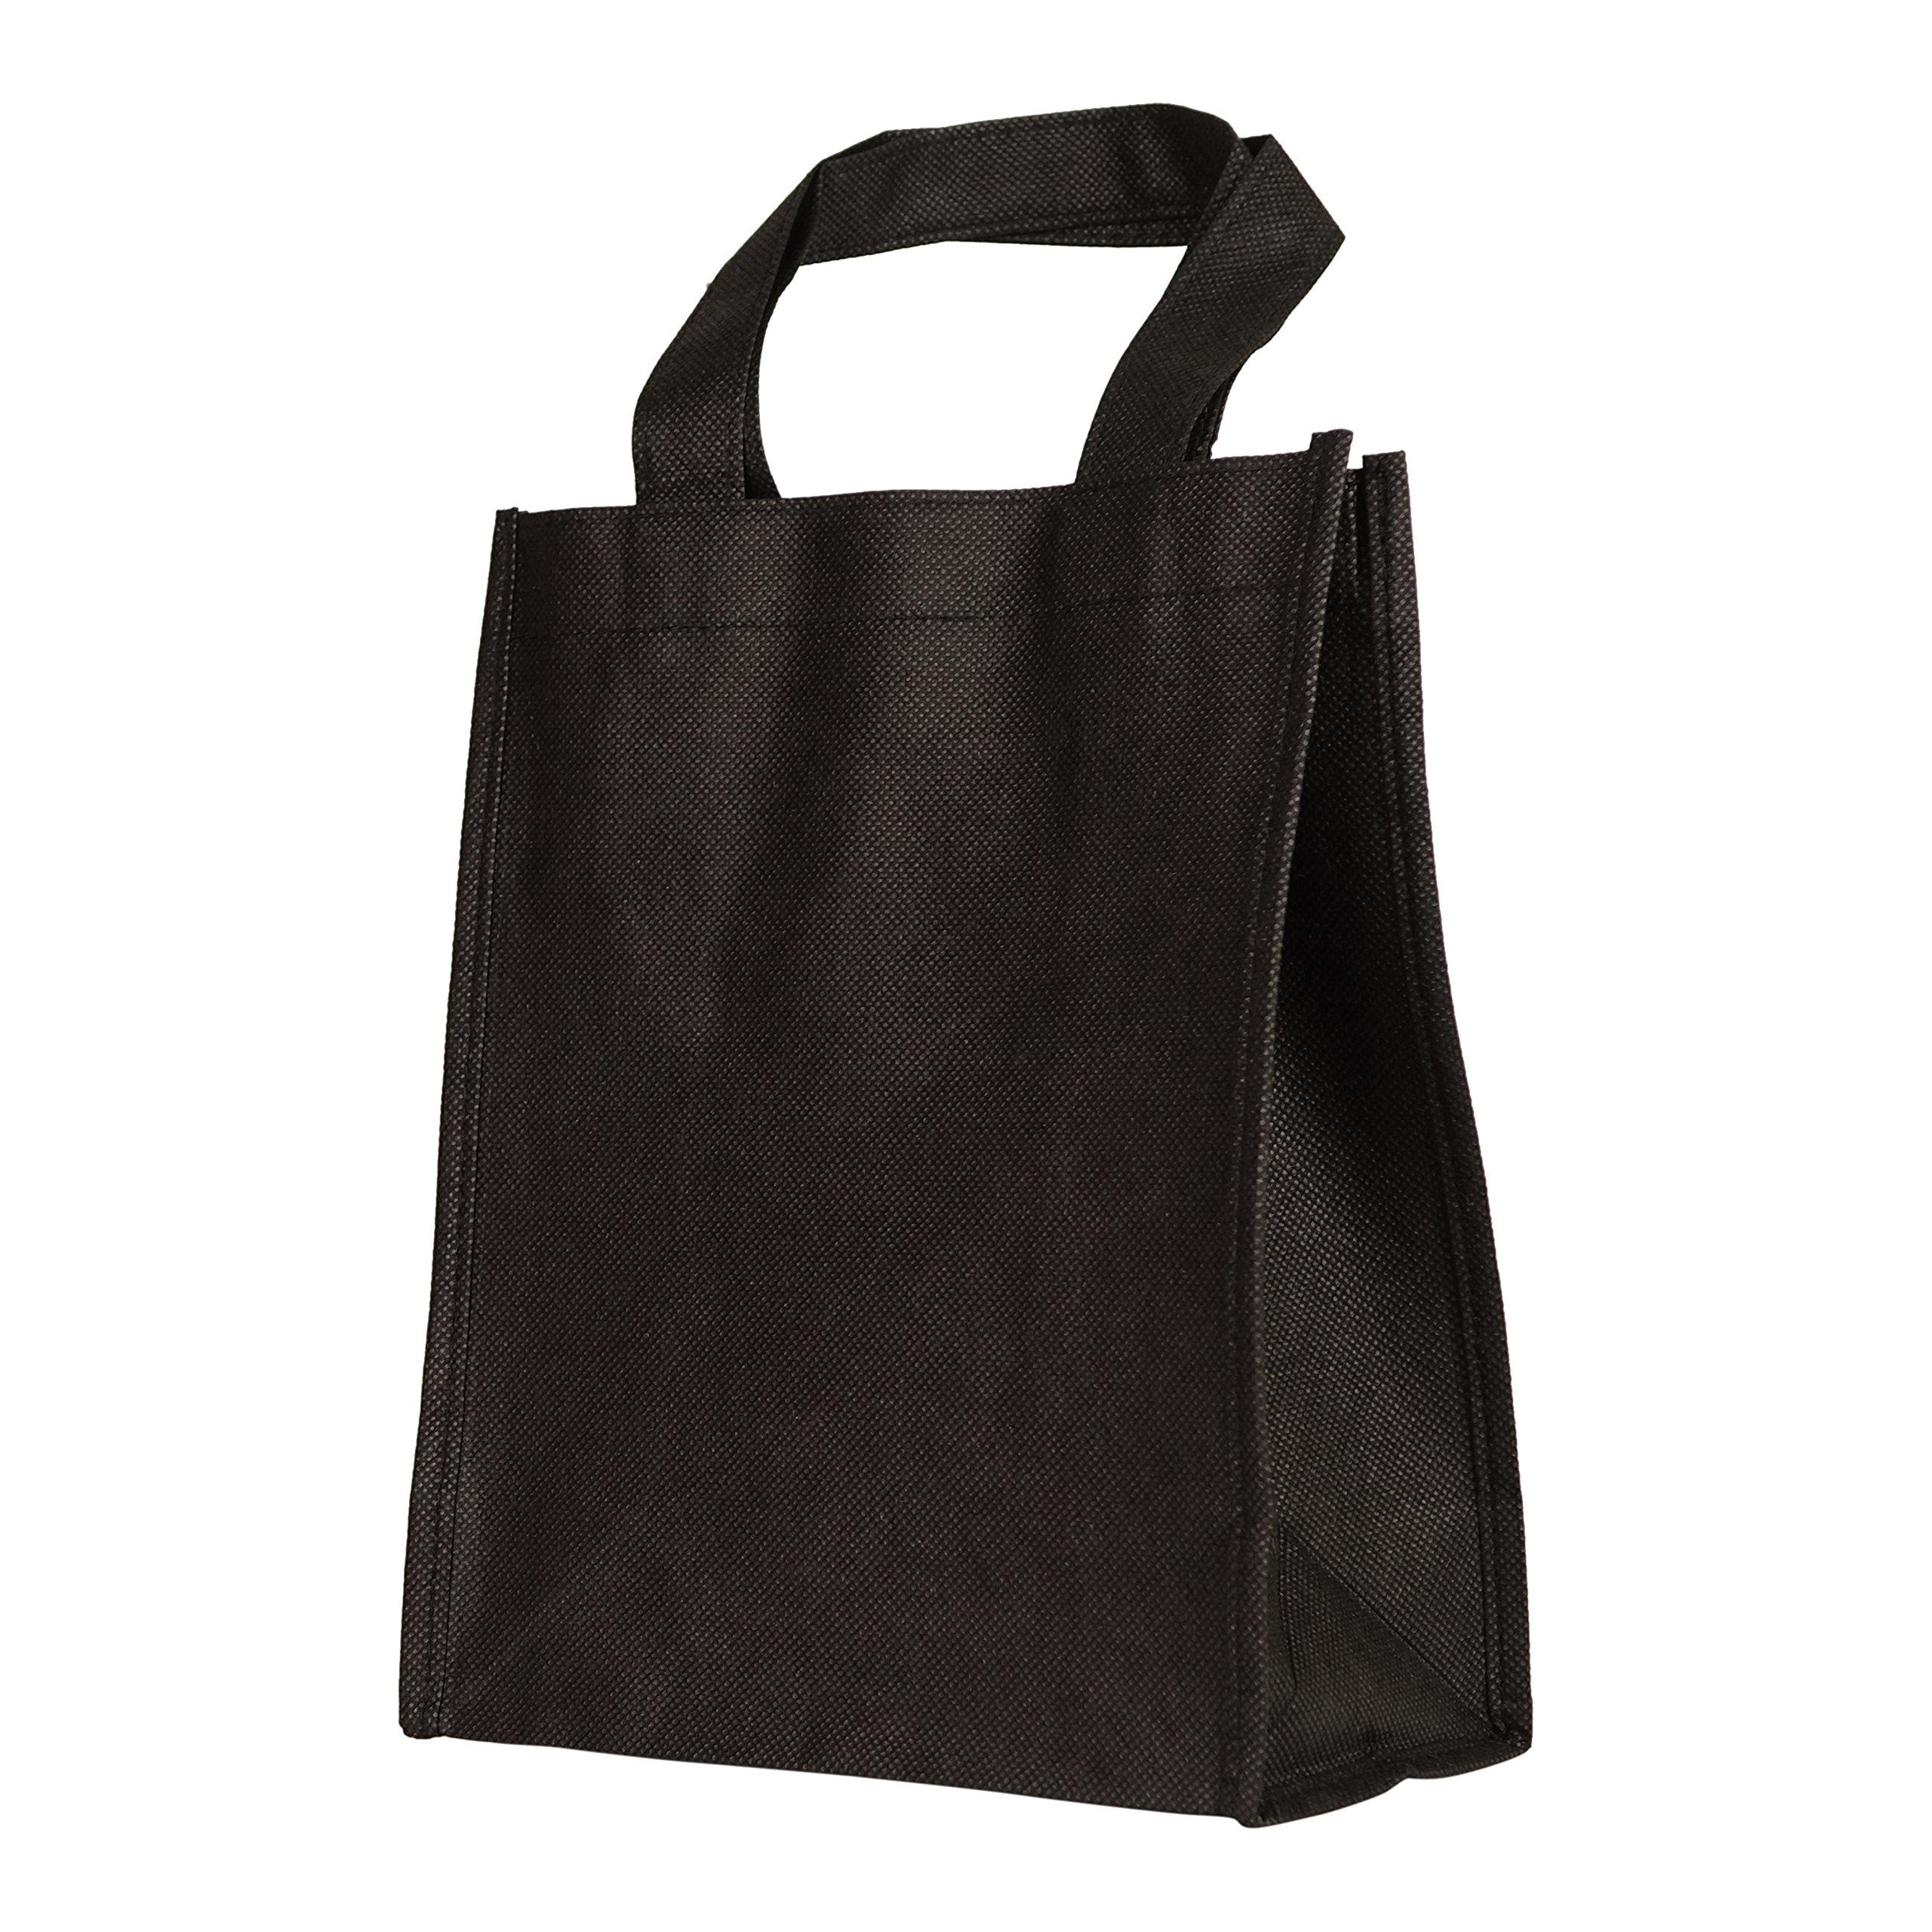 NuFazes 8'' x 10'' Mini Shopping Reuseable Cute Gift Tote Bag - Black (2 Pack)